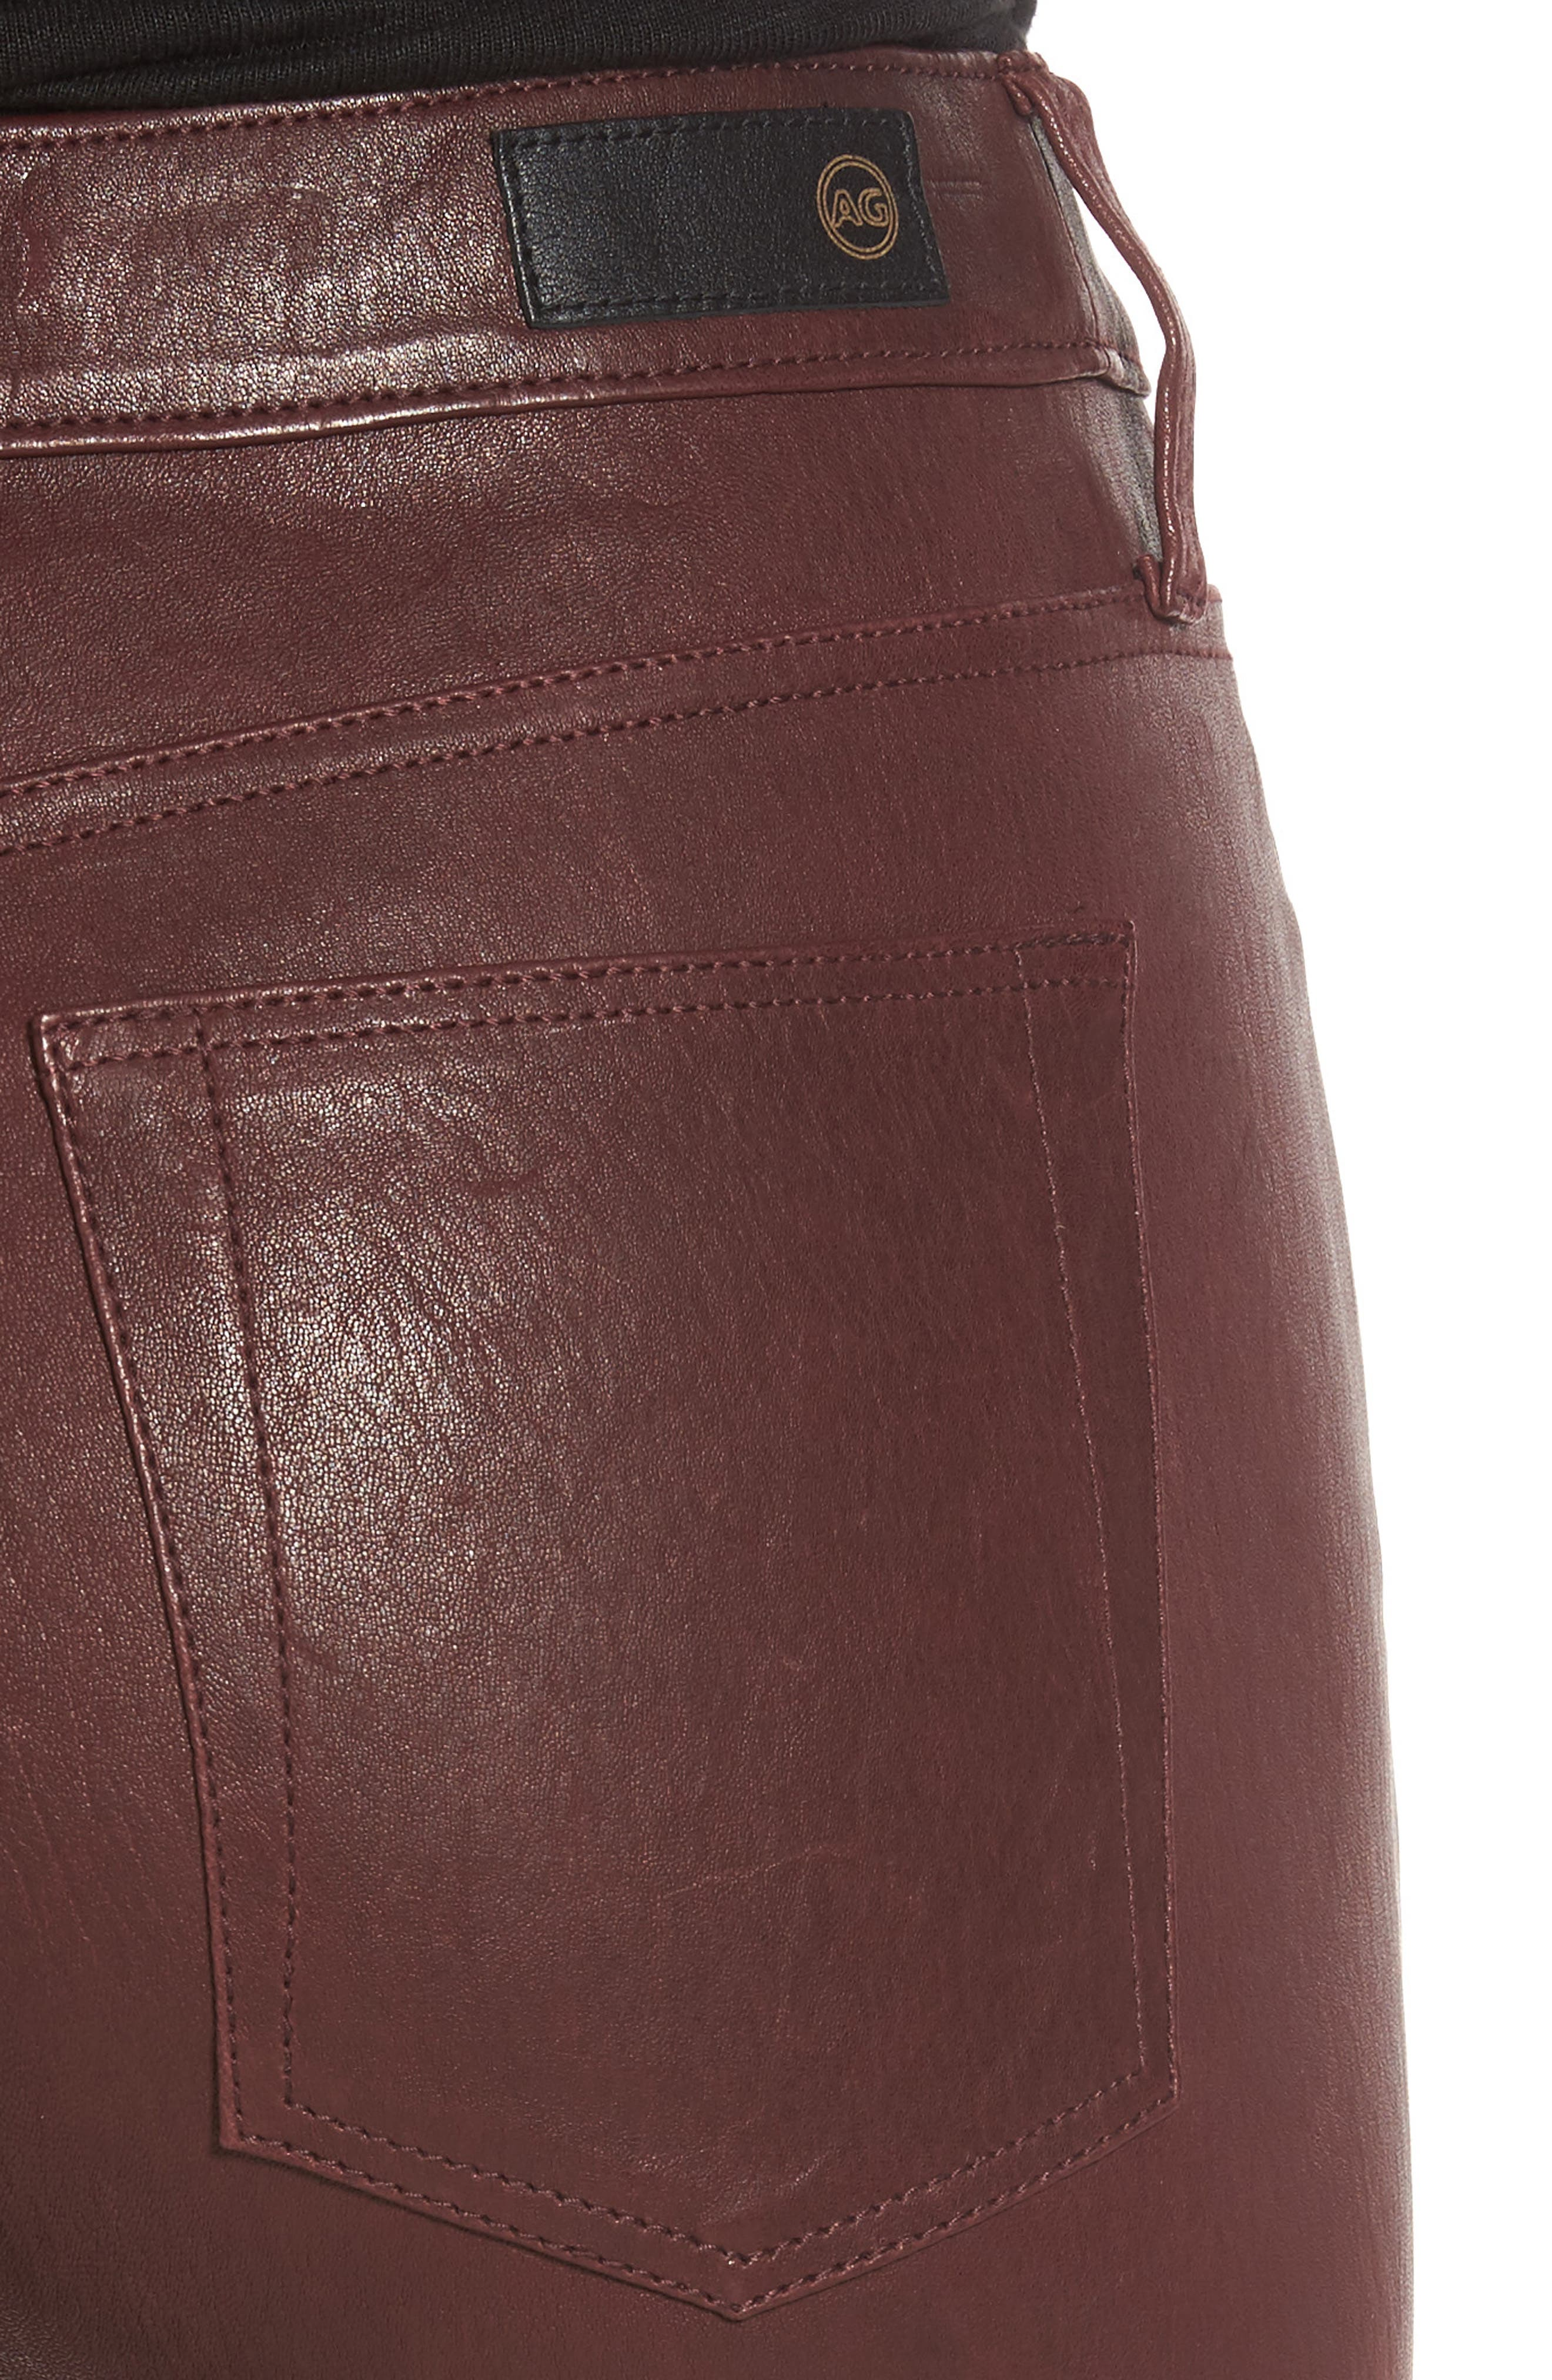 Farrah Leather Skinny Jeans,                             Alternate thumbnail 12, color,